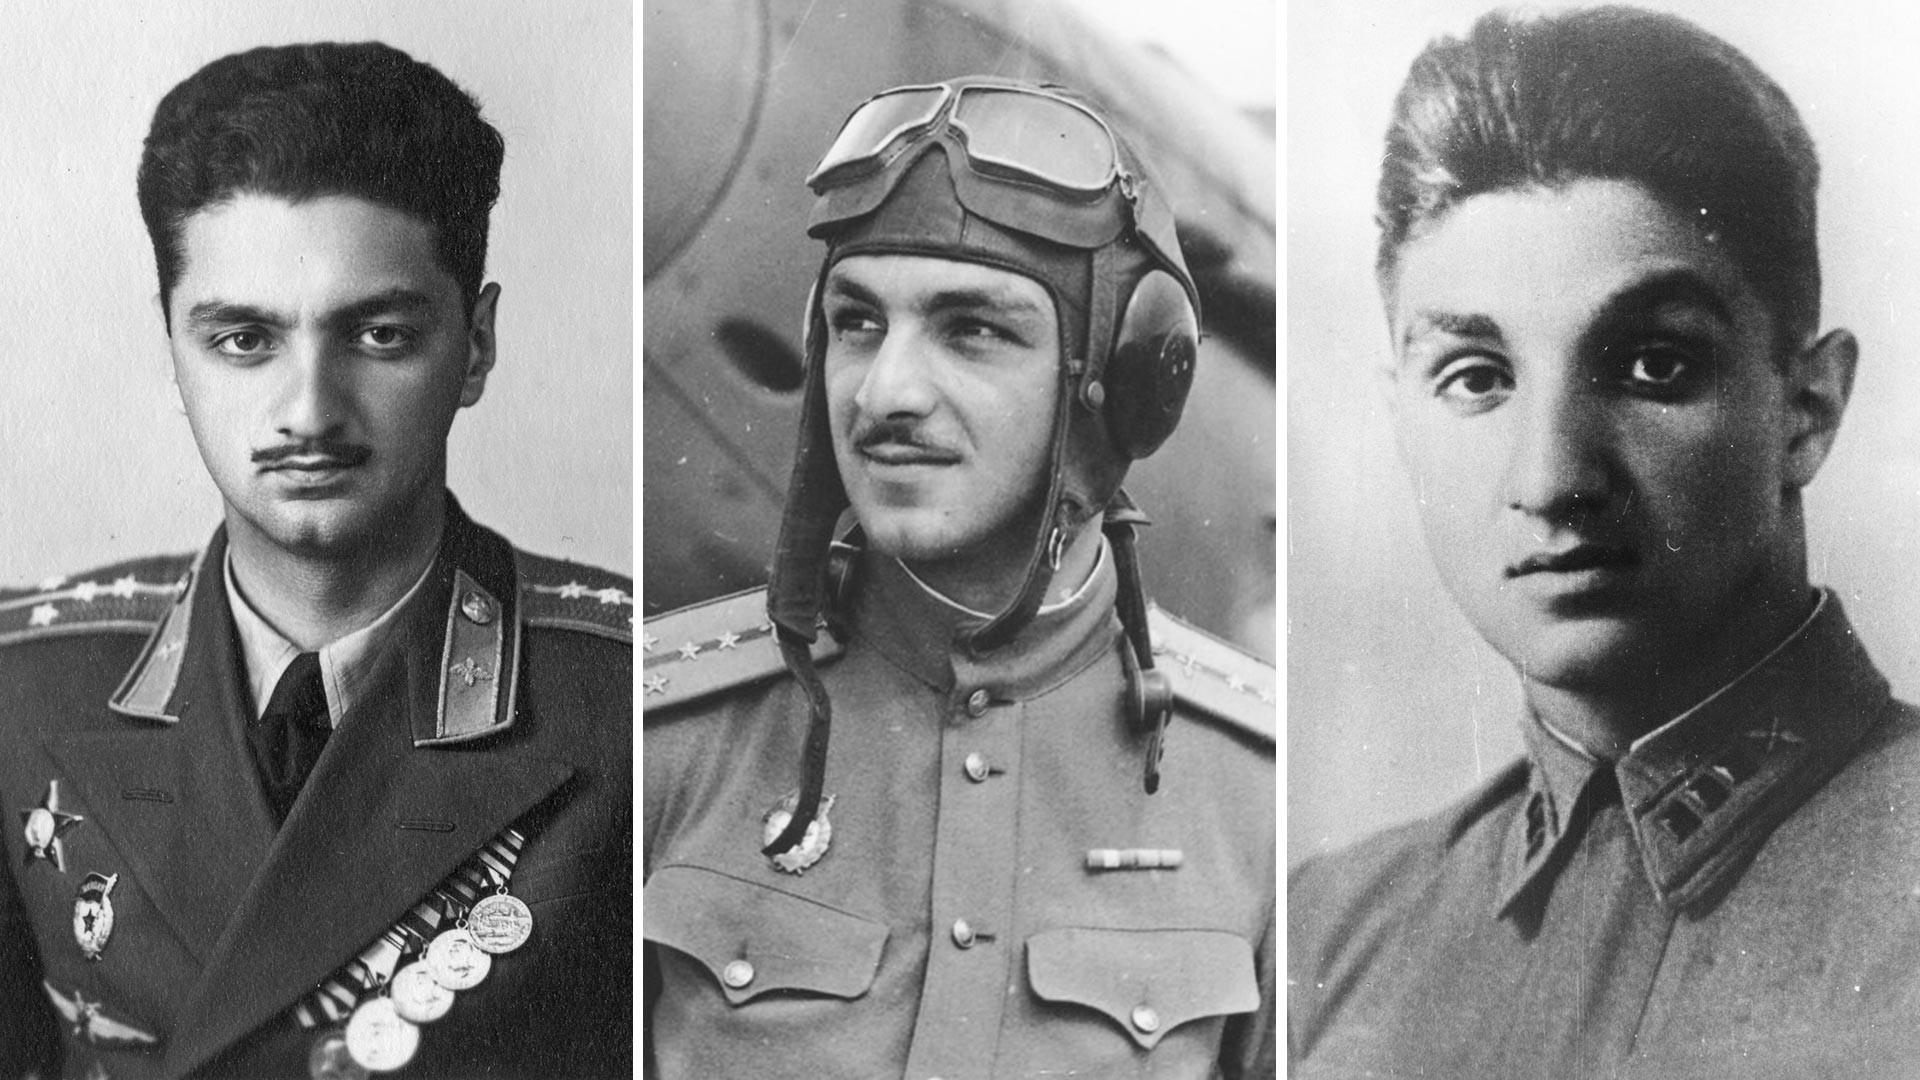 Алексей Микоян, Степан Микоян, Владимир Микоян